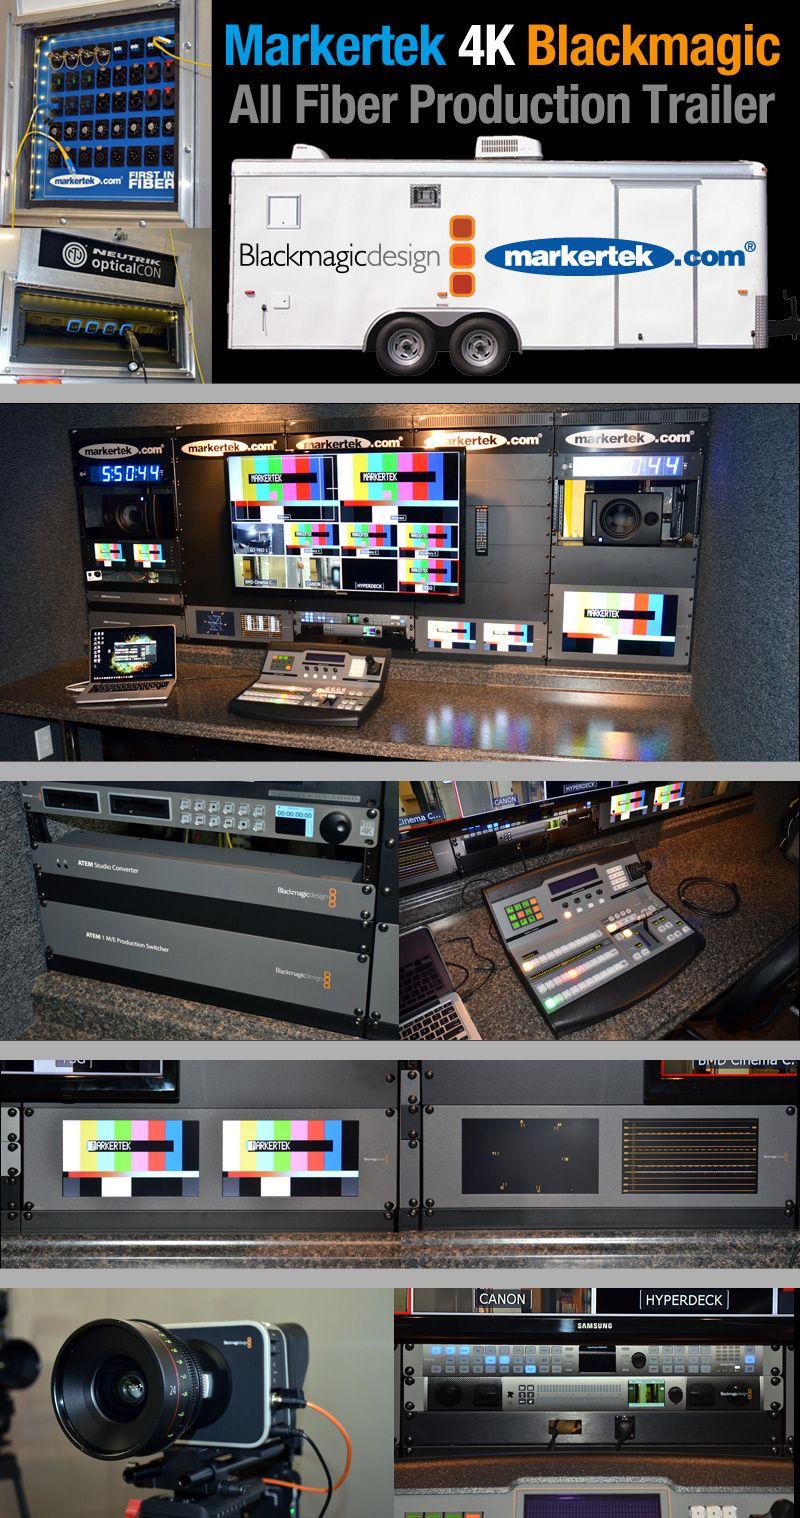 Blackmagic Fiber Ready 4K Production Trailer. See more